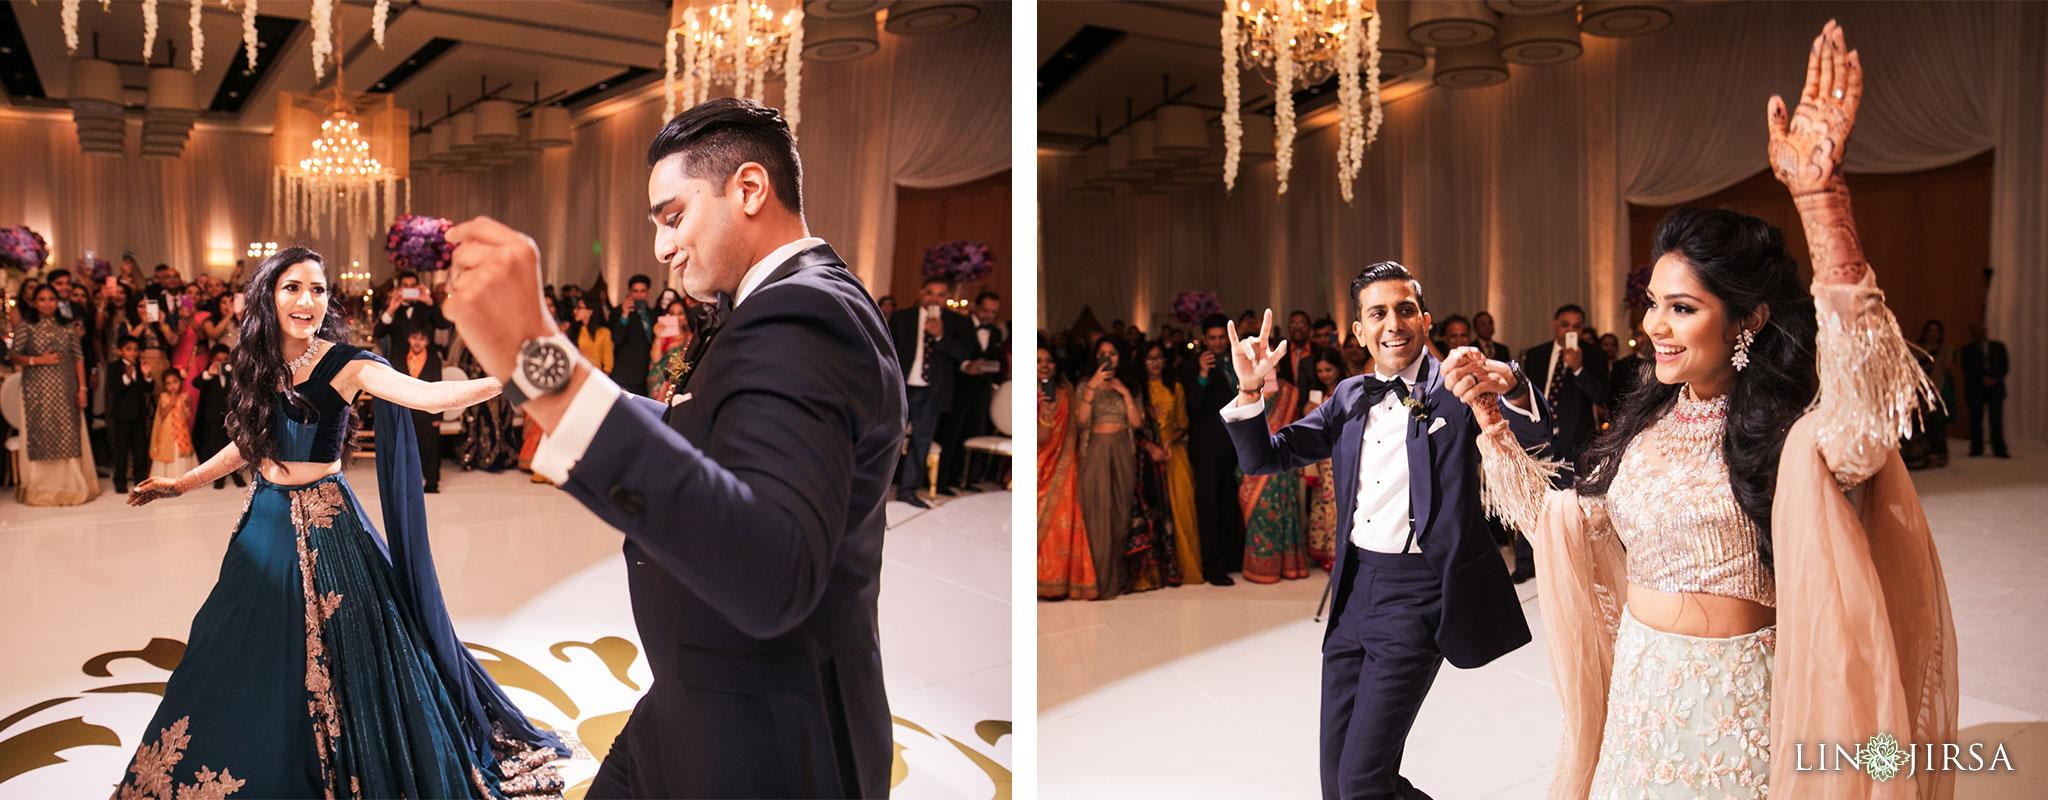 021 terranea resort rancho palos verdes indian wedding reception photography